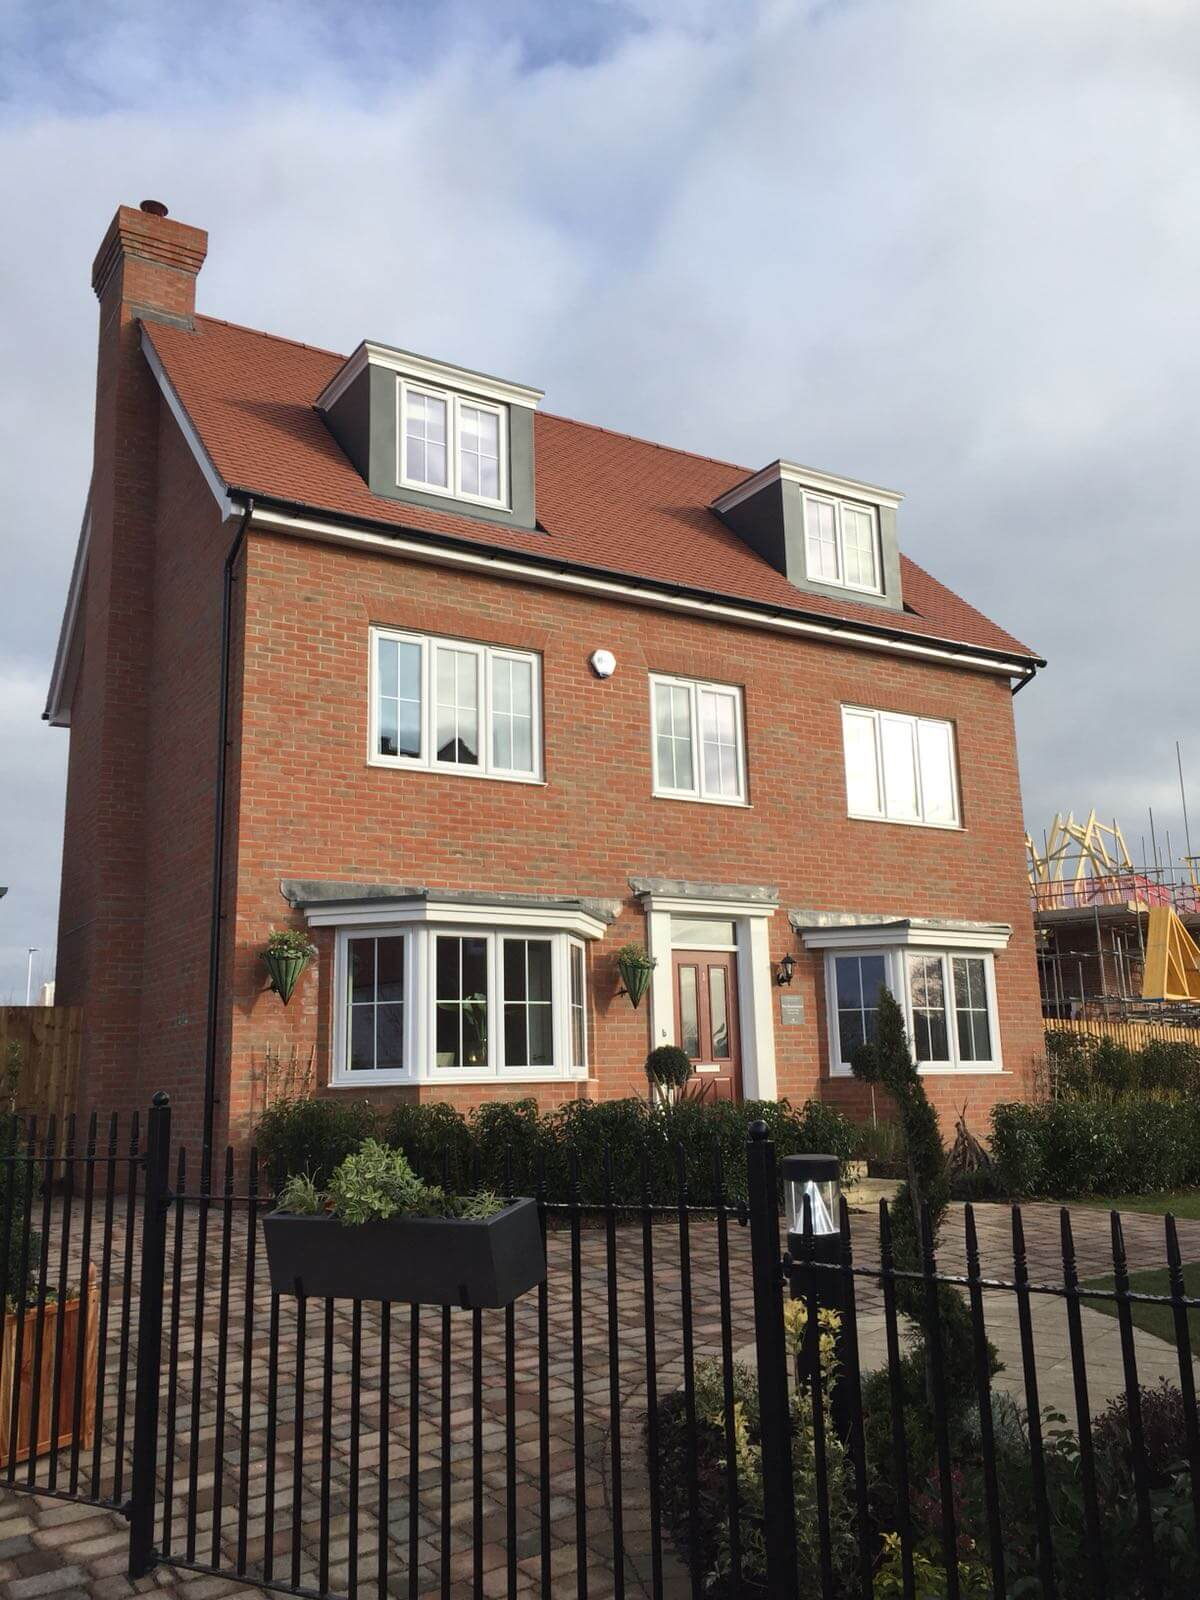 Glevum are installing windows and doors for Countryside Properties St. Michael's Hurst development